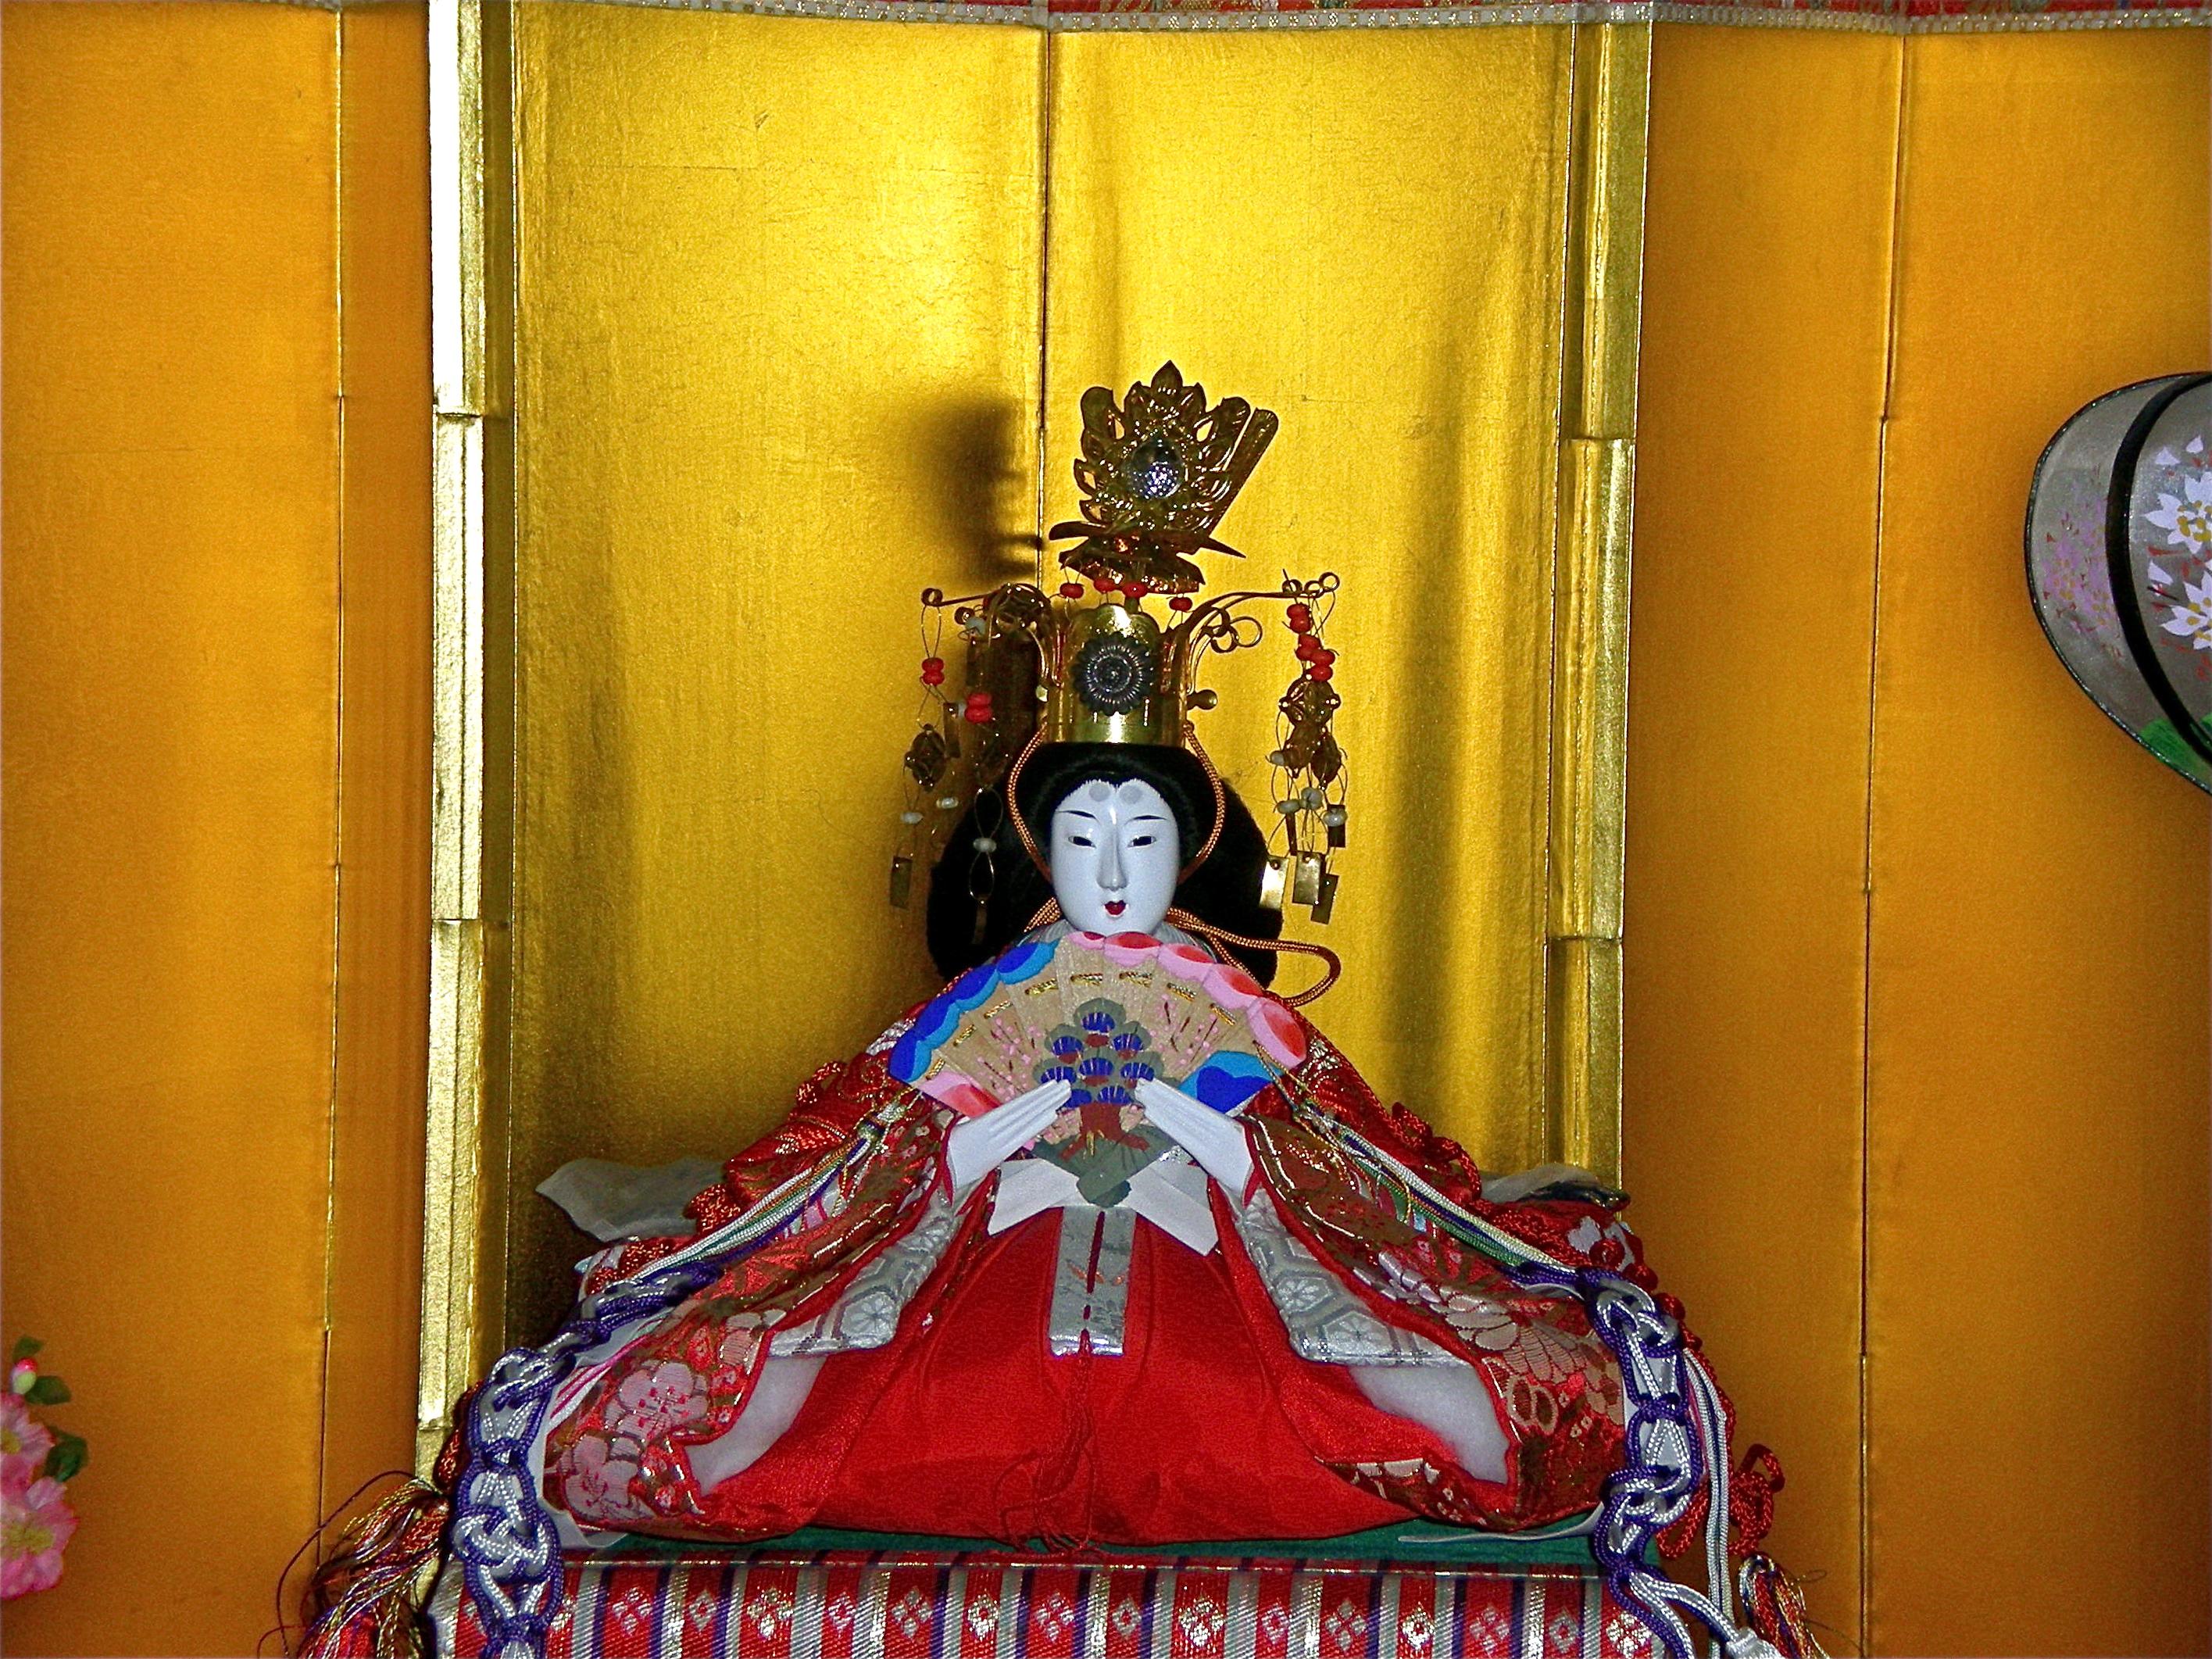 Hina Matsuri Doll by Chron1